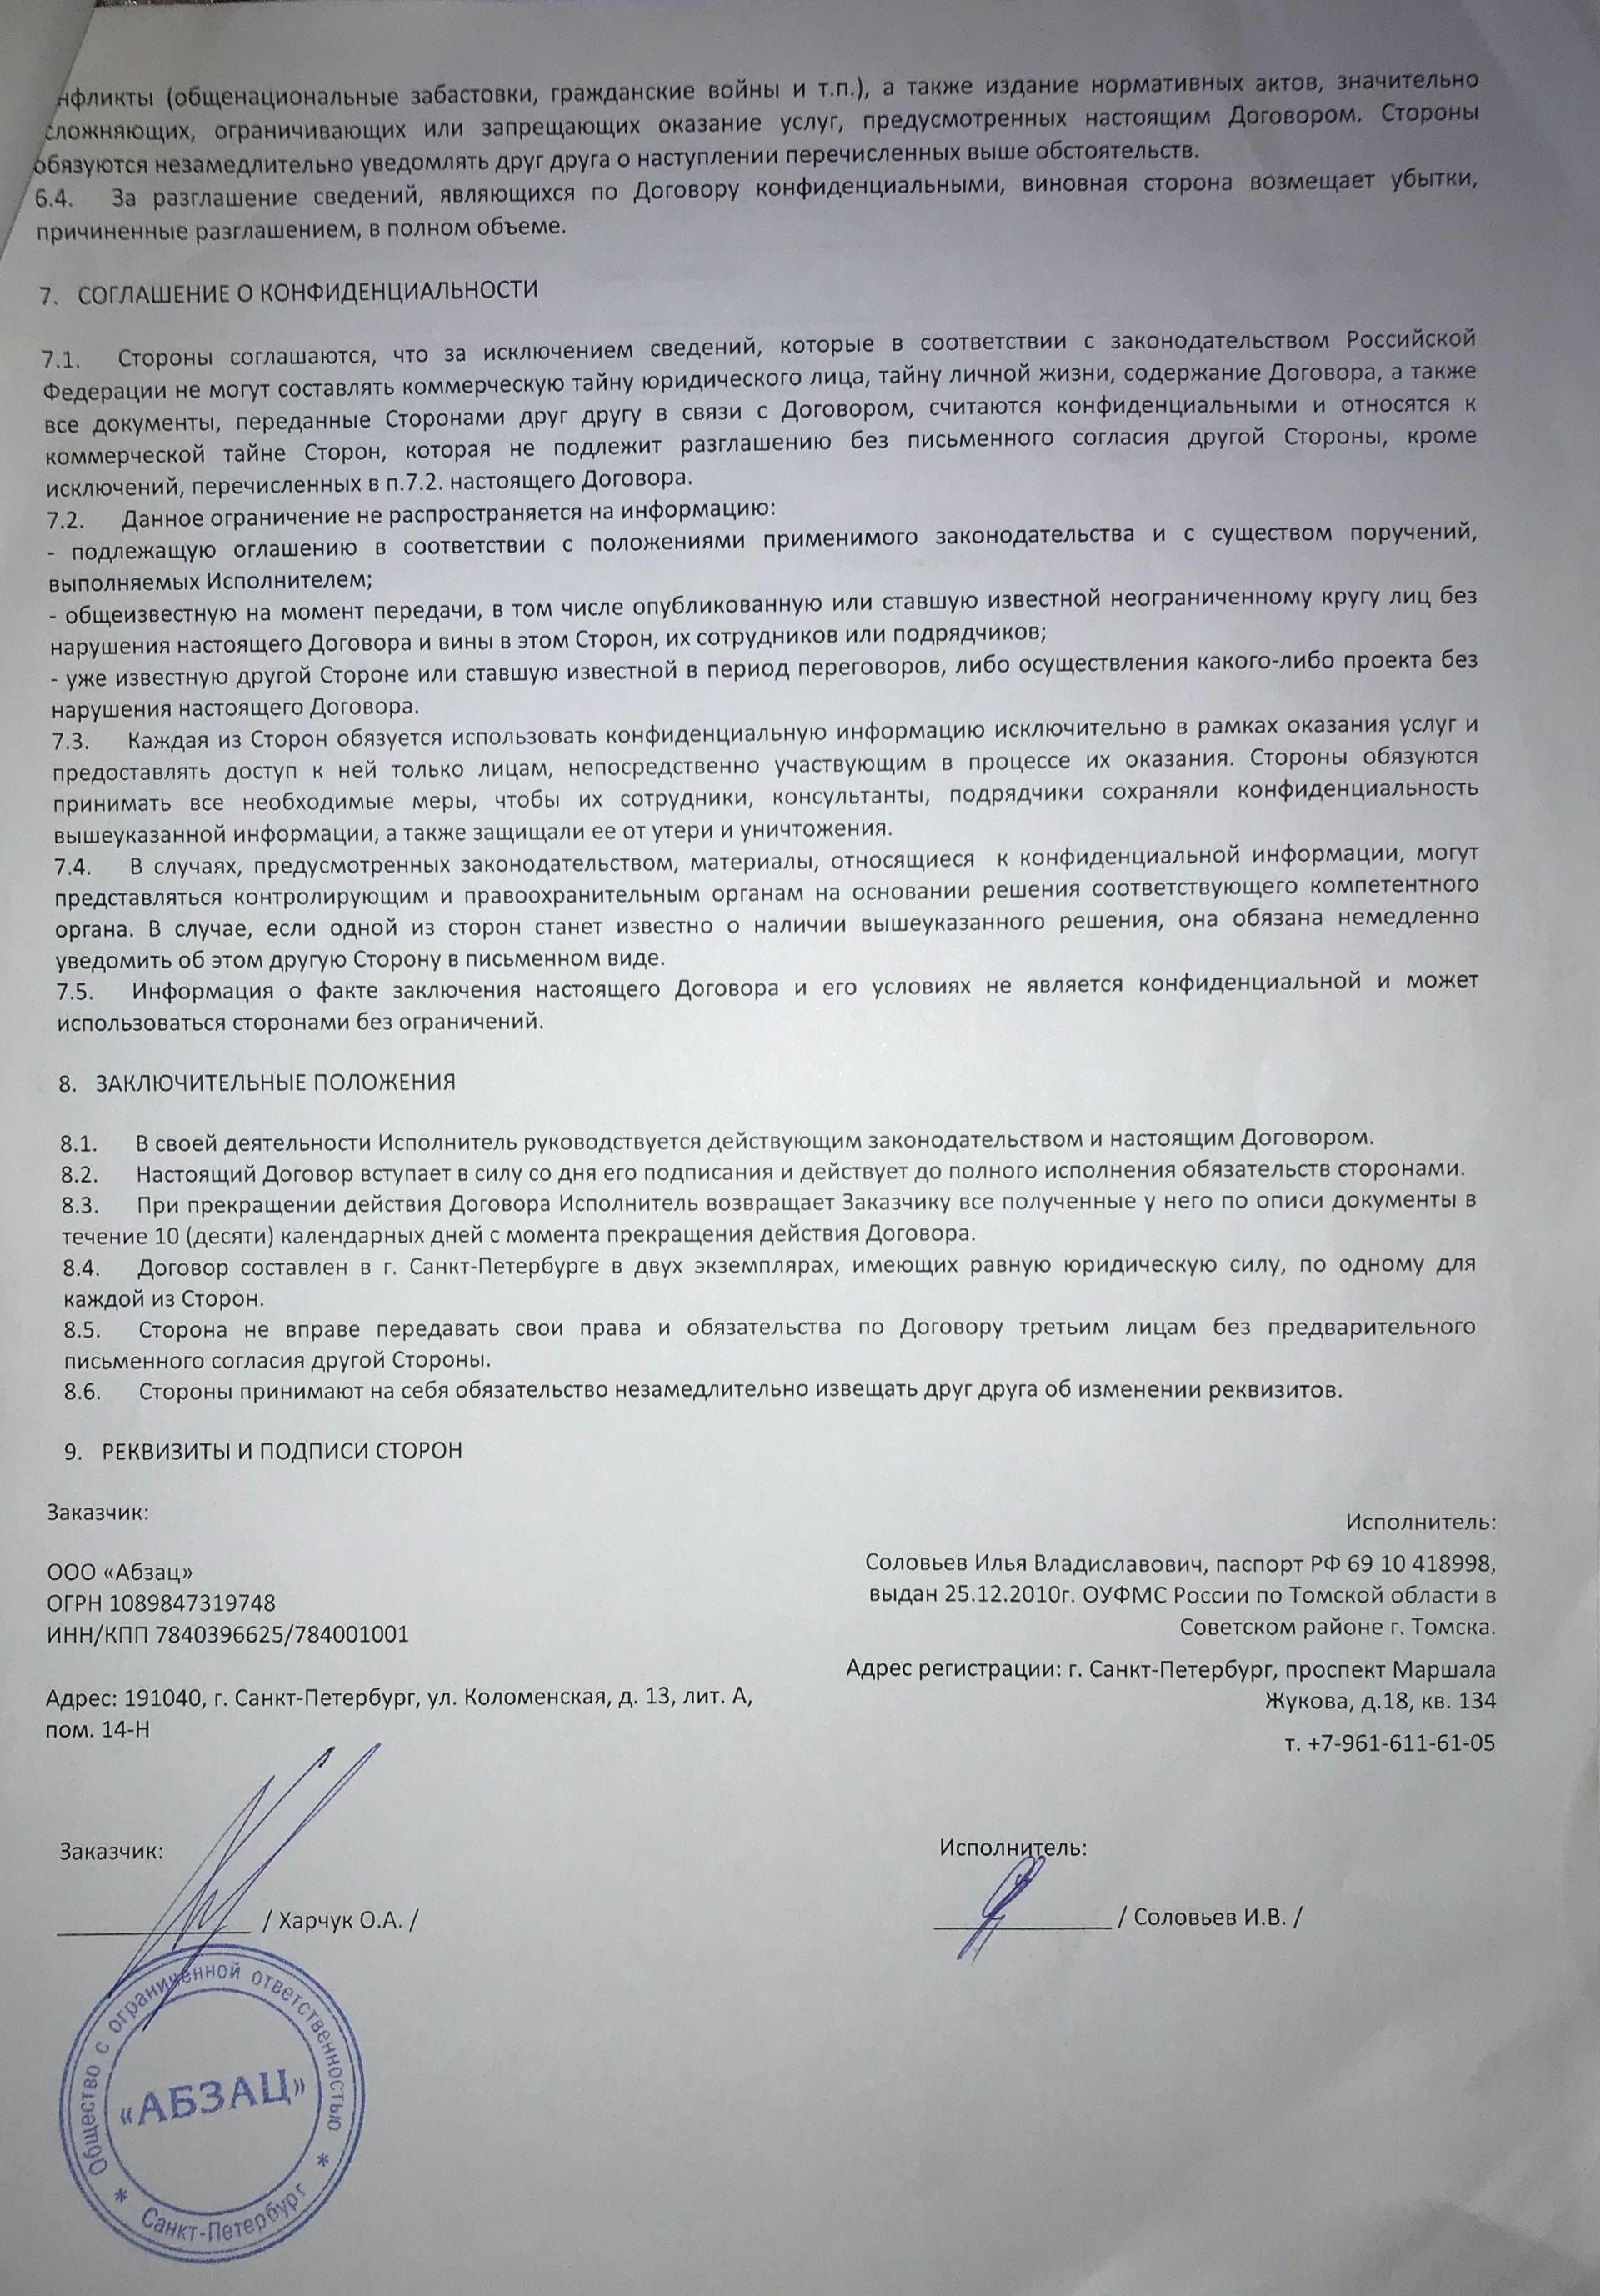 Договор с юристом №3, лист 2